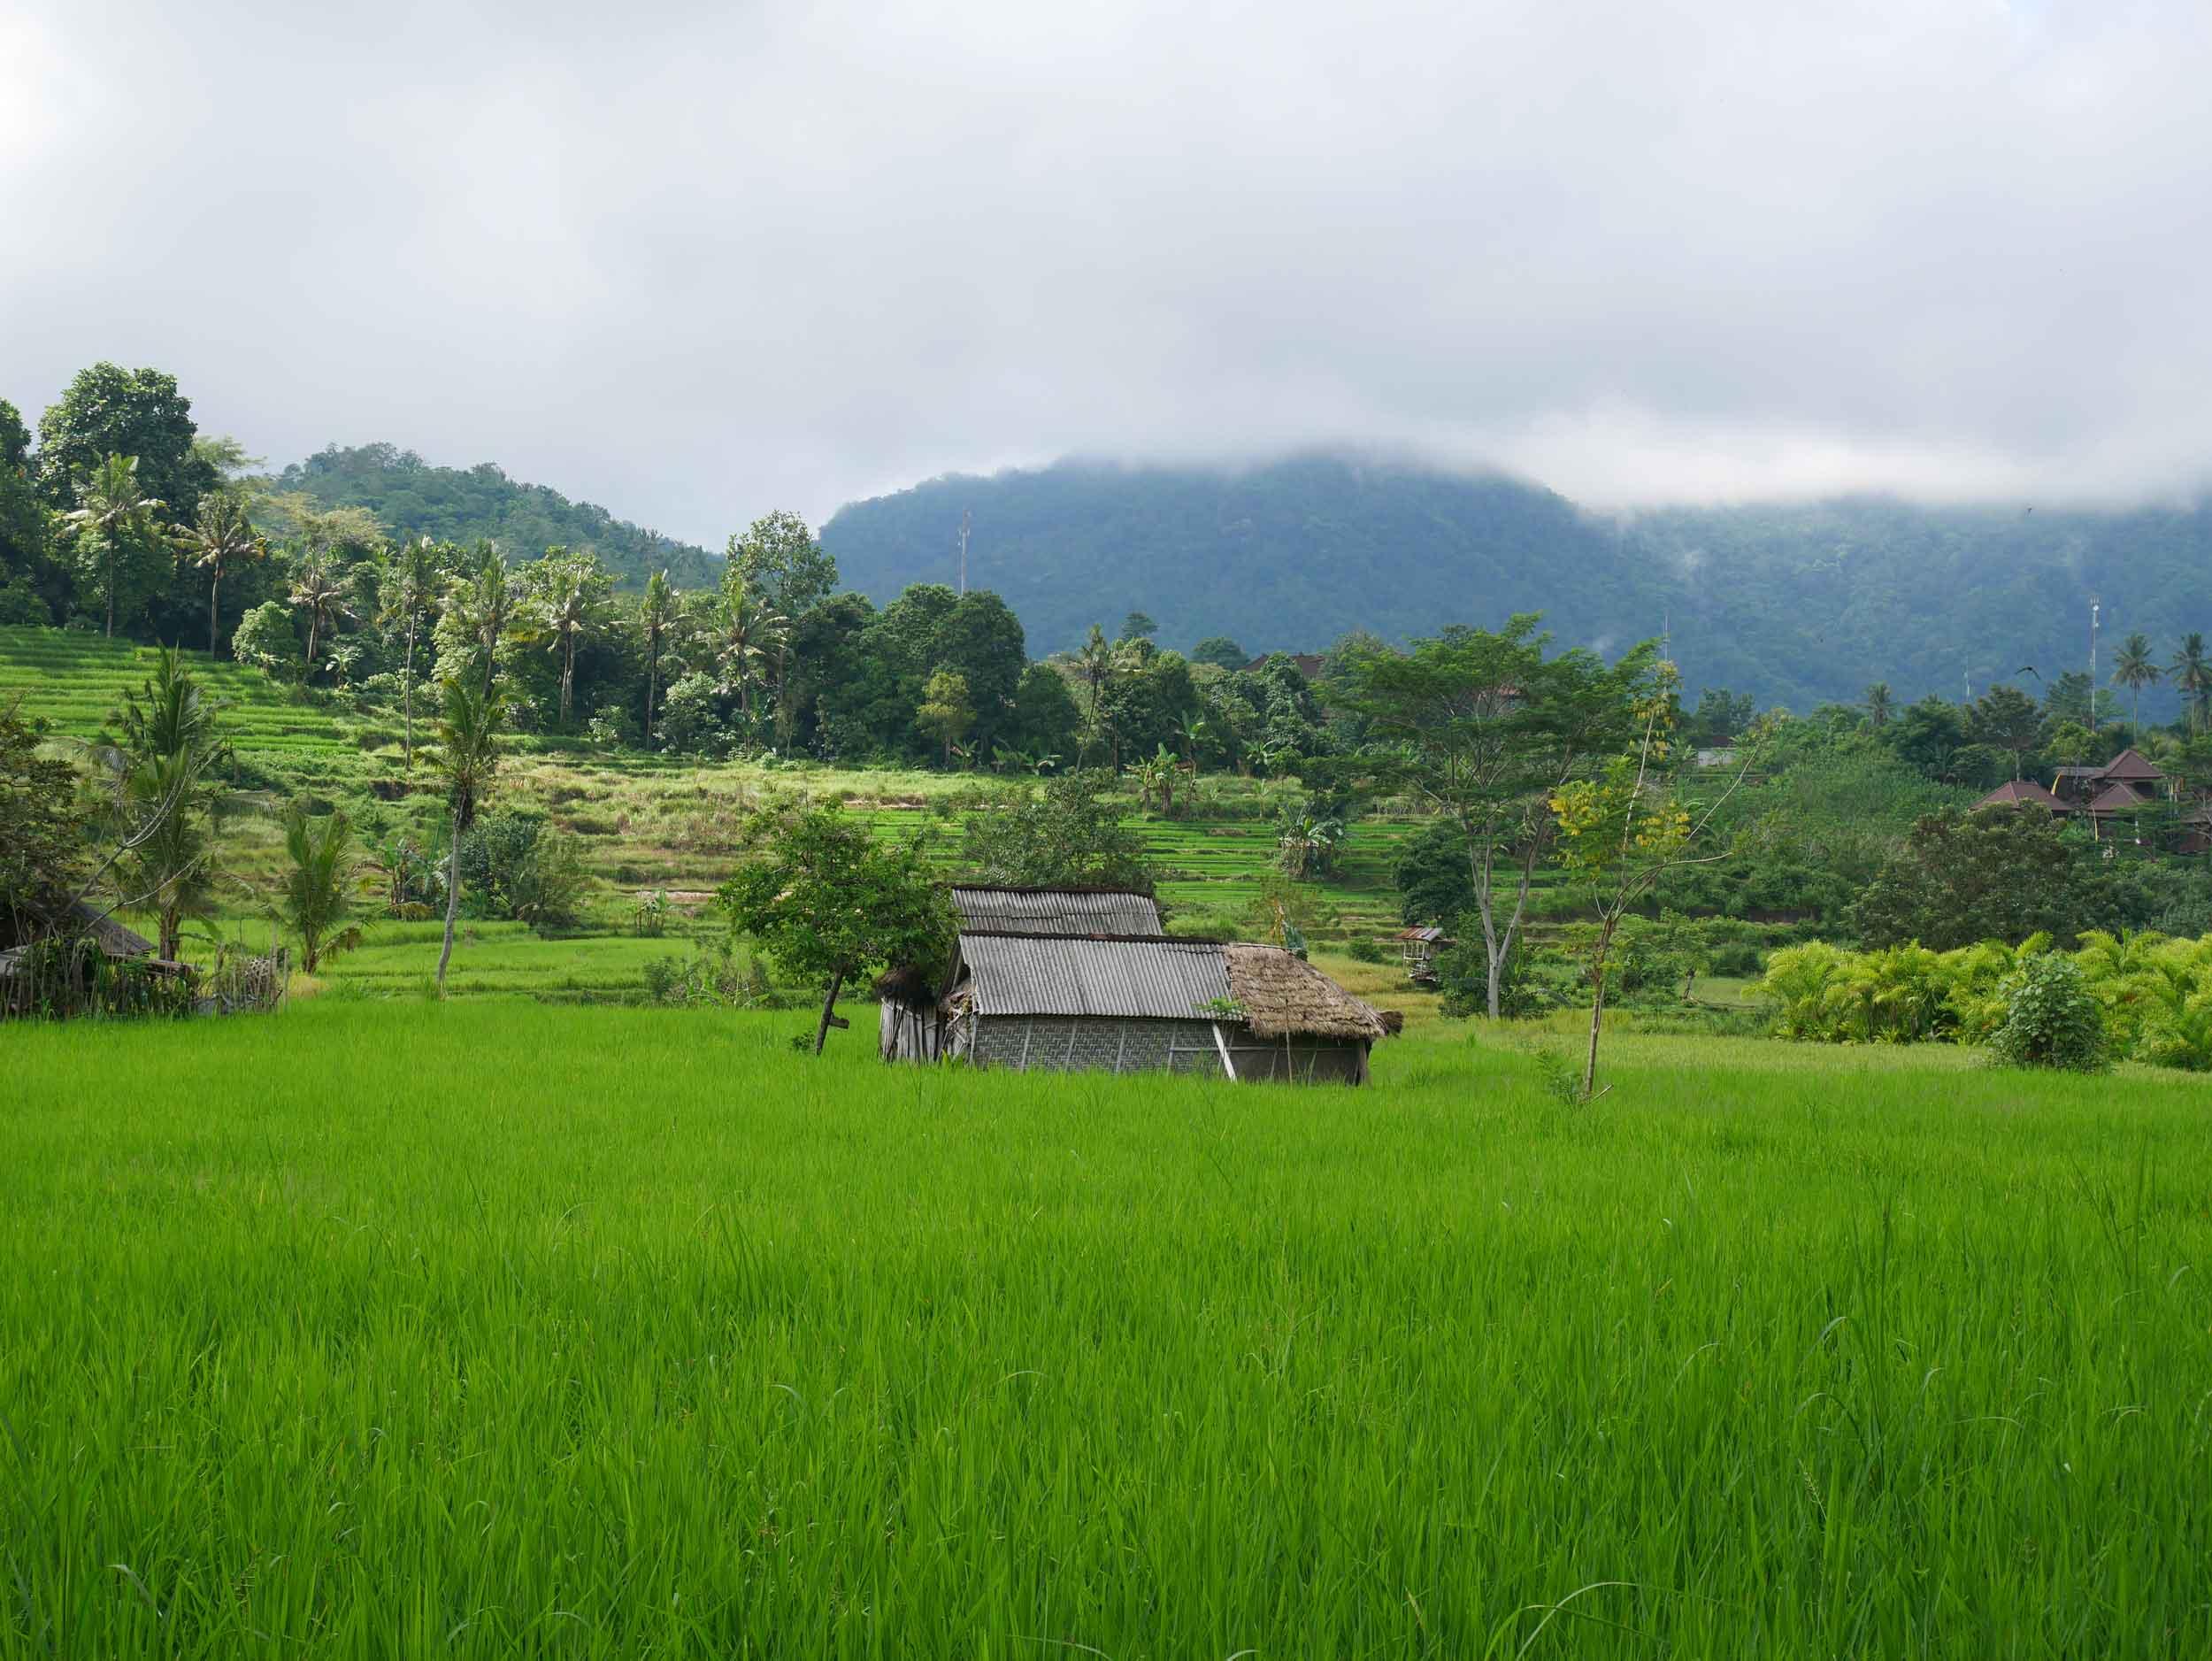 The bright green fields and surrounding hills of Sidemen were a beautiful sight.